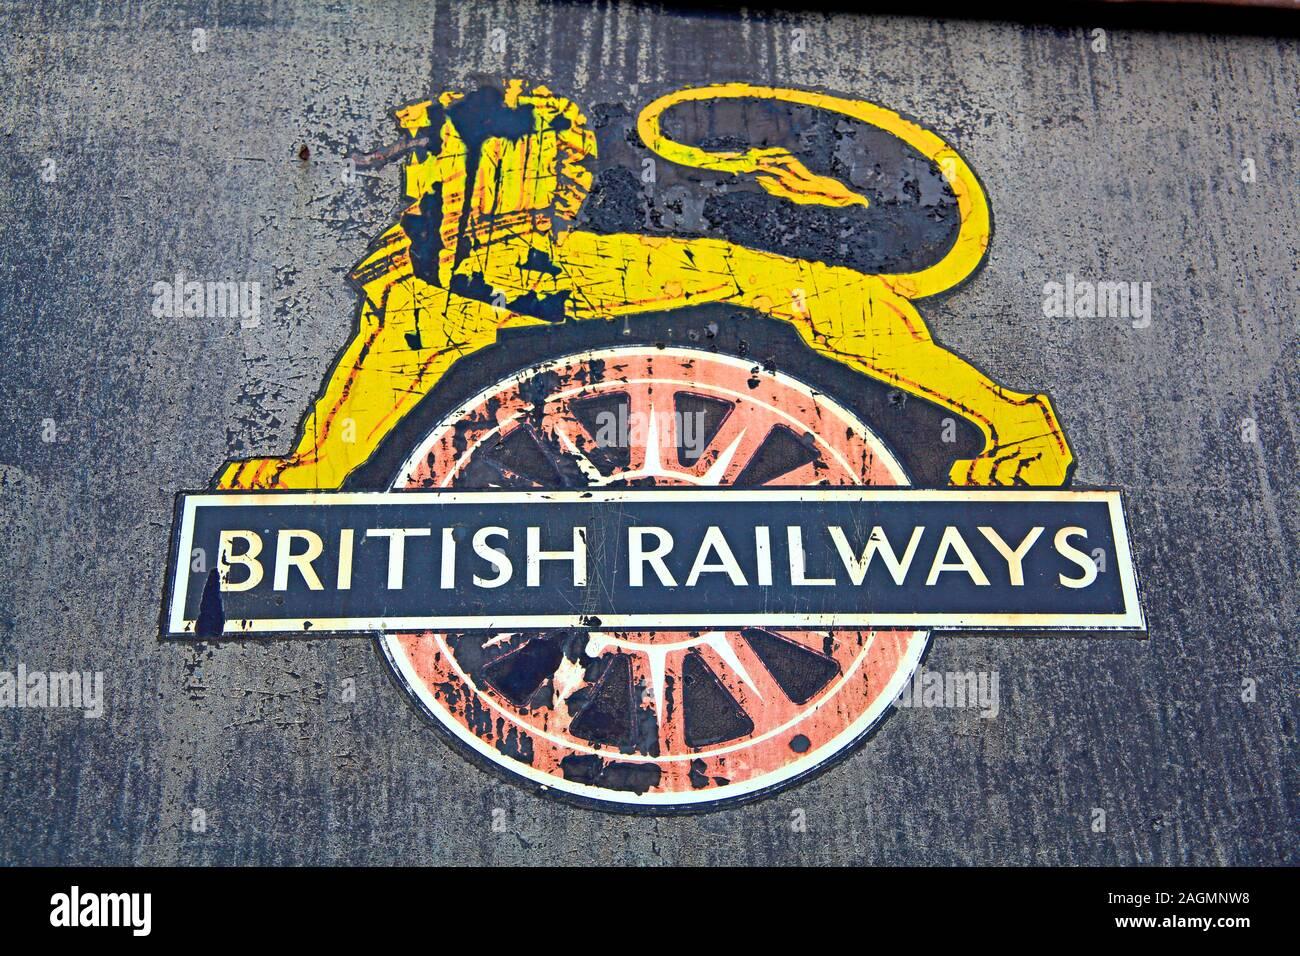 HotpixUK,@HotpixUK,GoTonySmith,rail,railway,trains,engine,transport,BR,UK,Great Britain,Crewe,Cheshire,England,lion,old,fading,logo,Crewe Works British Railways,steam,engines,locomotive,locomotives,steam locomotive,steam engine,golden age,BR Crewe,British Railway Crewe Works